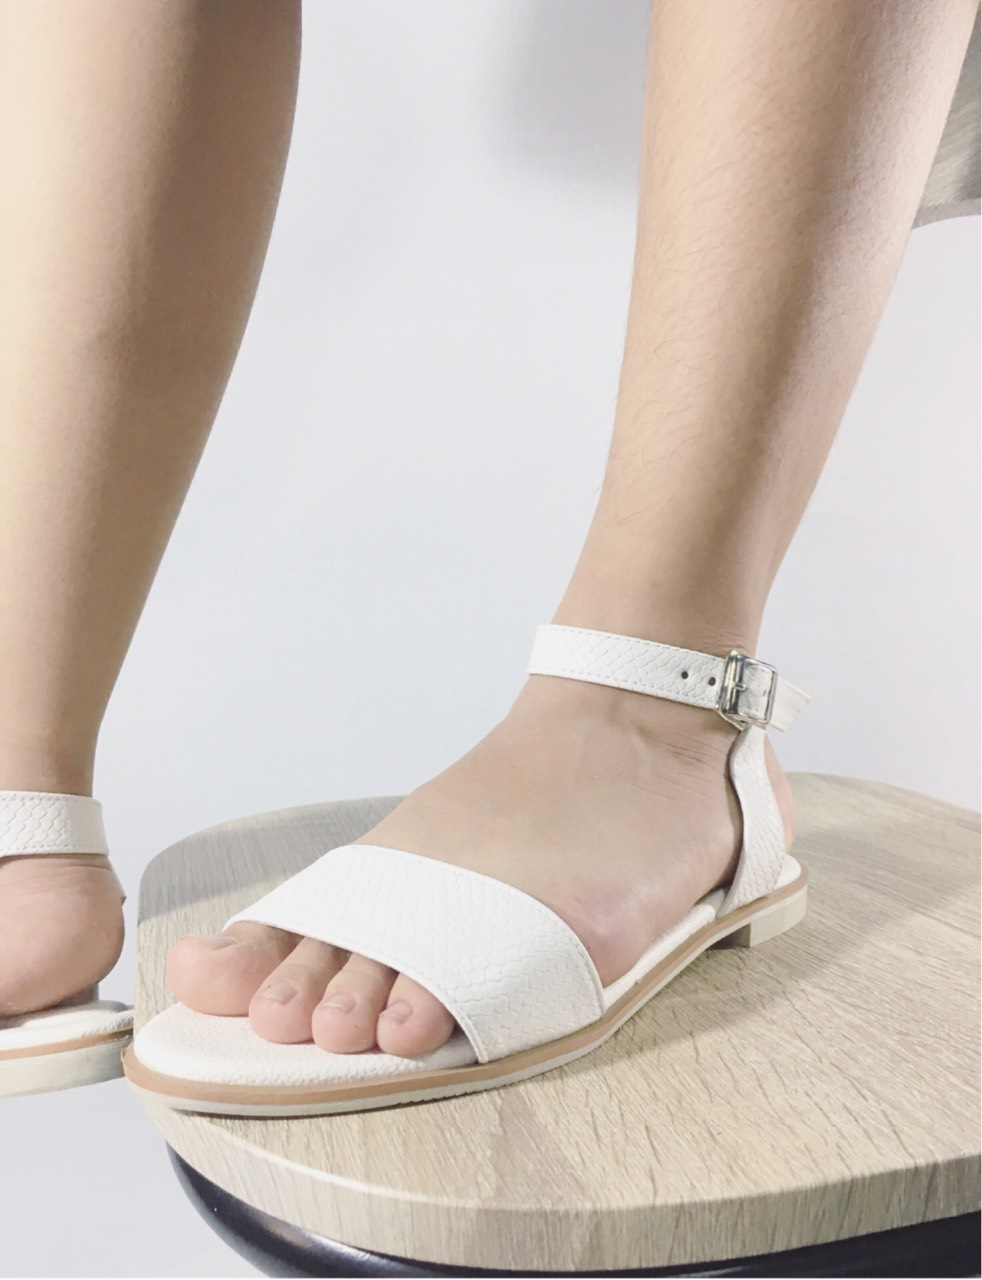 musthaveitem,รองเท้าแฟชั่น,รองเท้าผู้หญิง,รองเท้าแตะรัดส้น,รองเท้าแตะ,สีดำ,black,blackandwhite,minimal,hipster,shoes,womenshoes,fashion,sandals